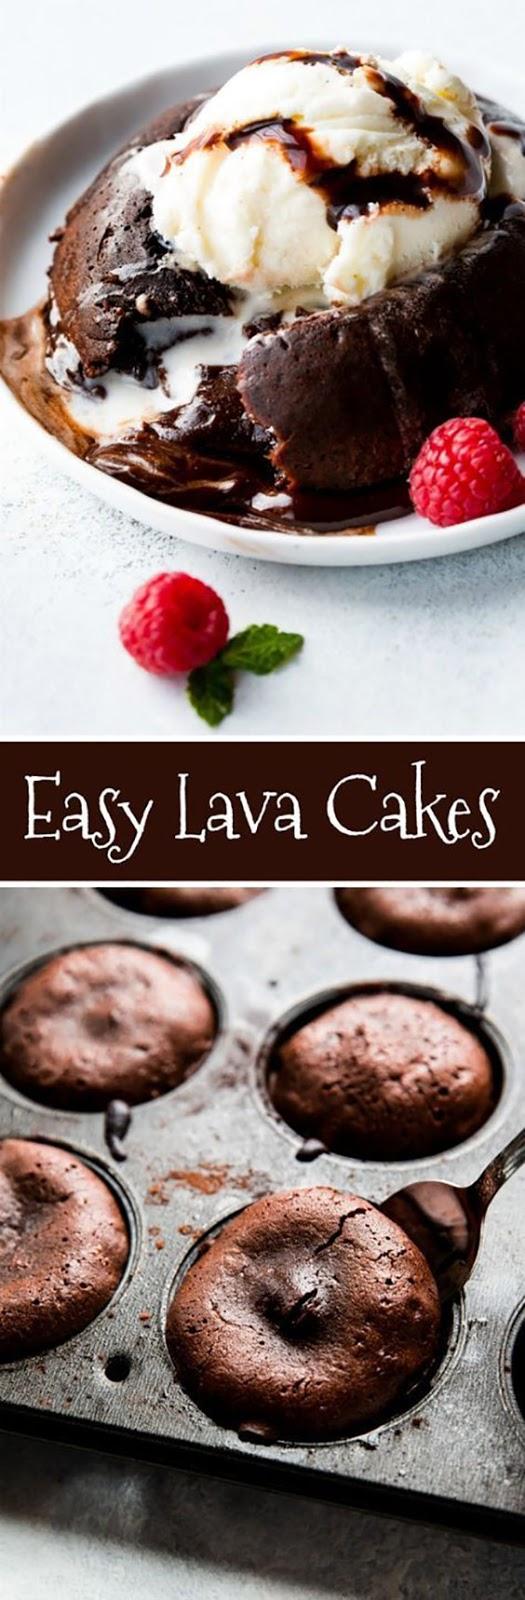 How to Make Chocolate Lava Cakes